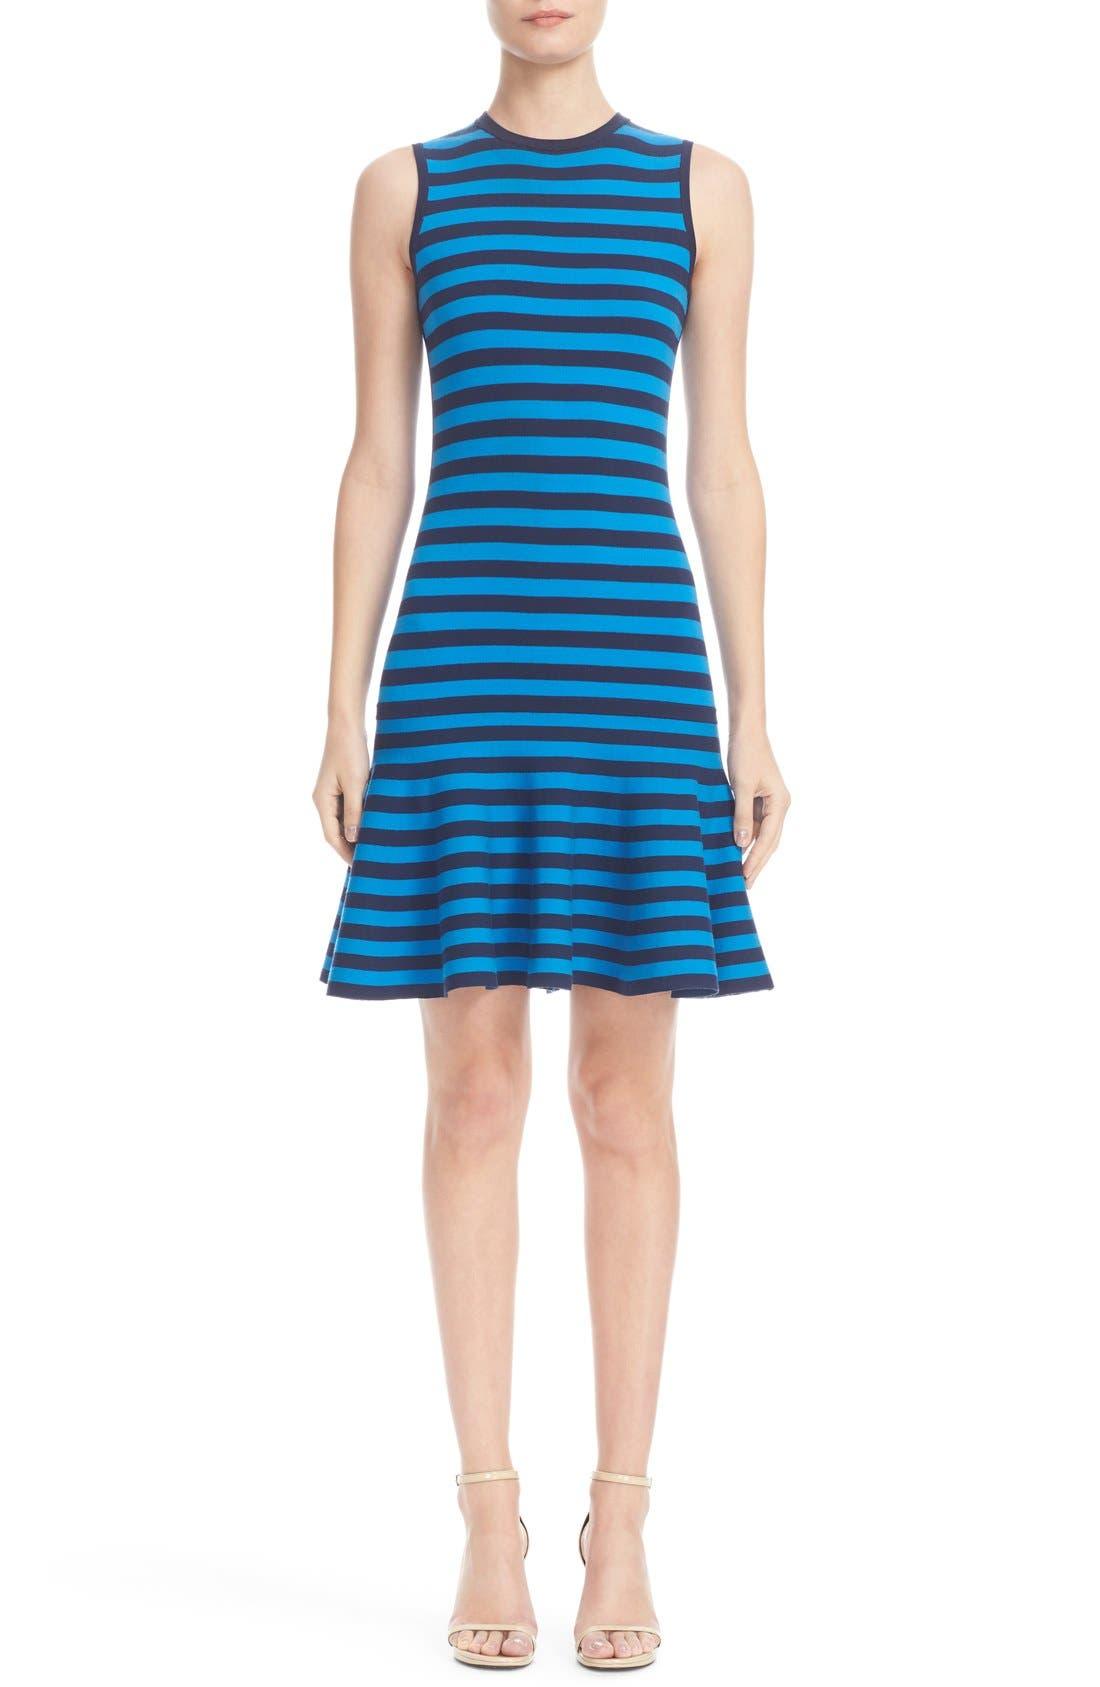 MICHAEL KORS Stripe Sleeveless Dress